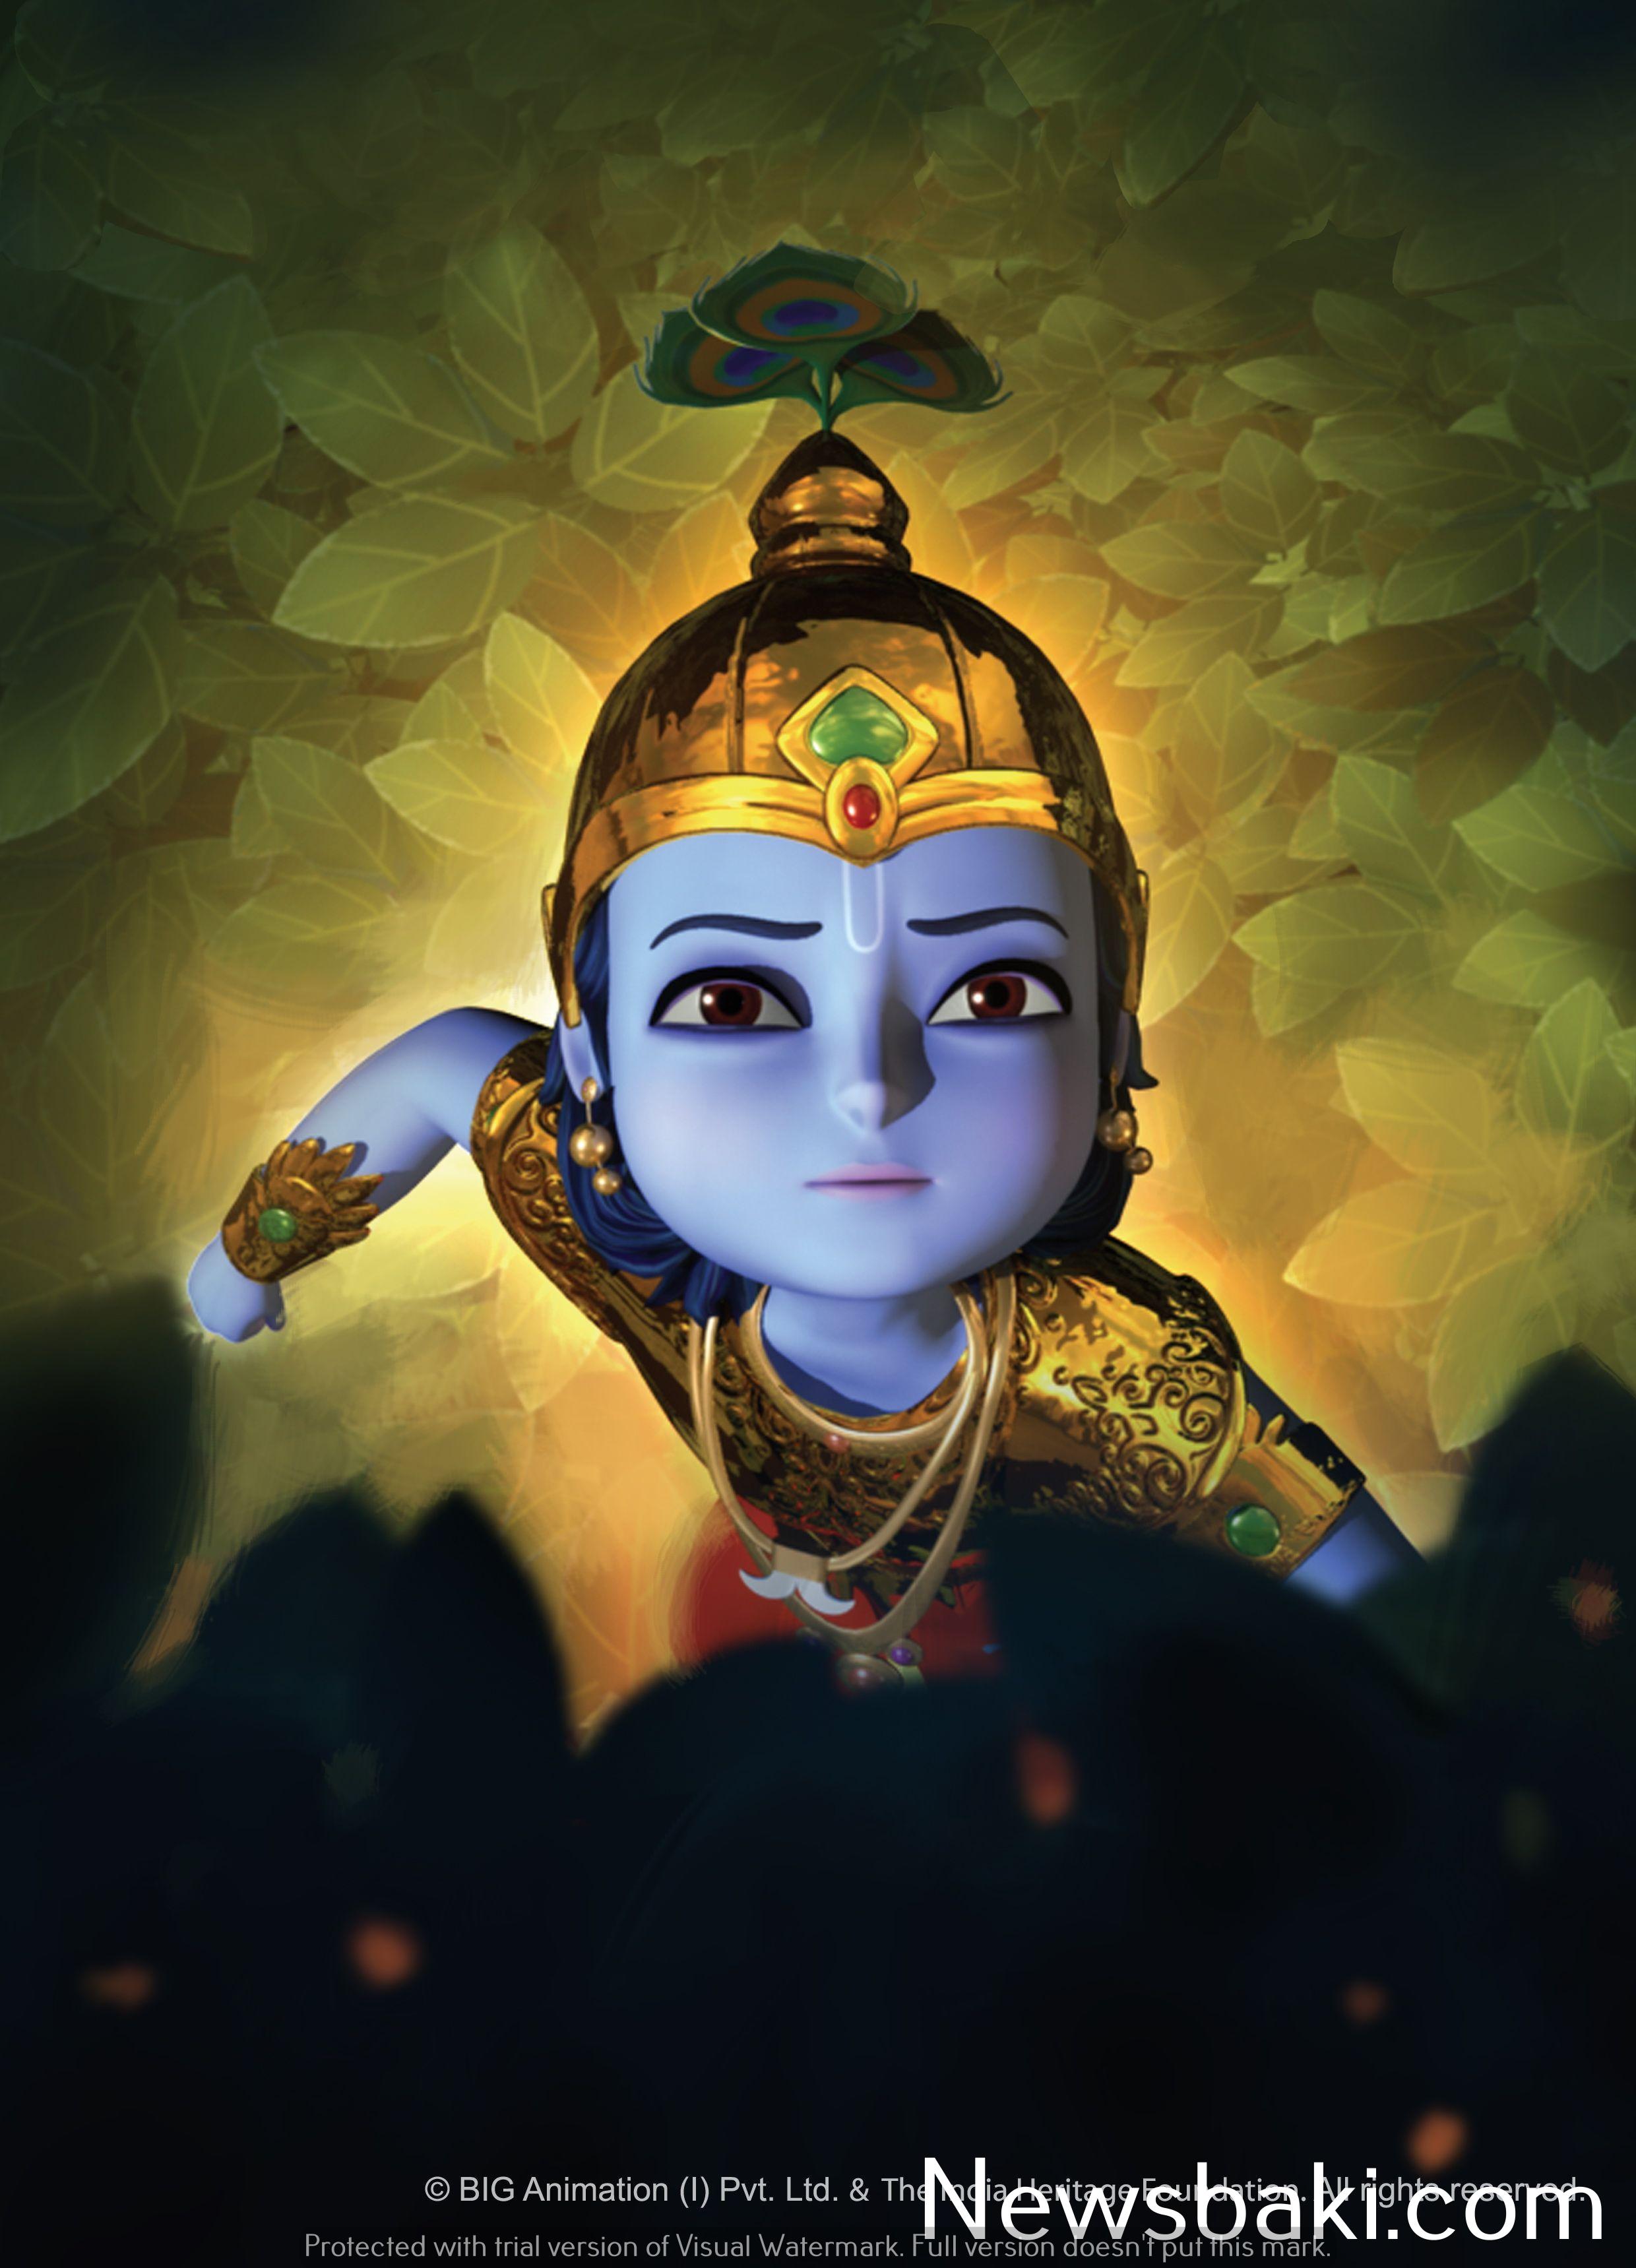 little lord krishna images hd nick 4